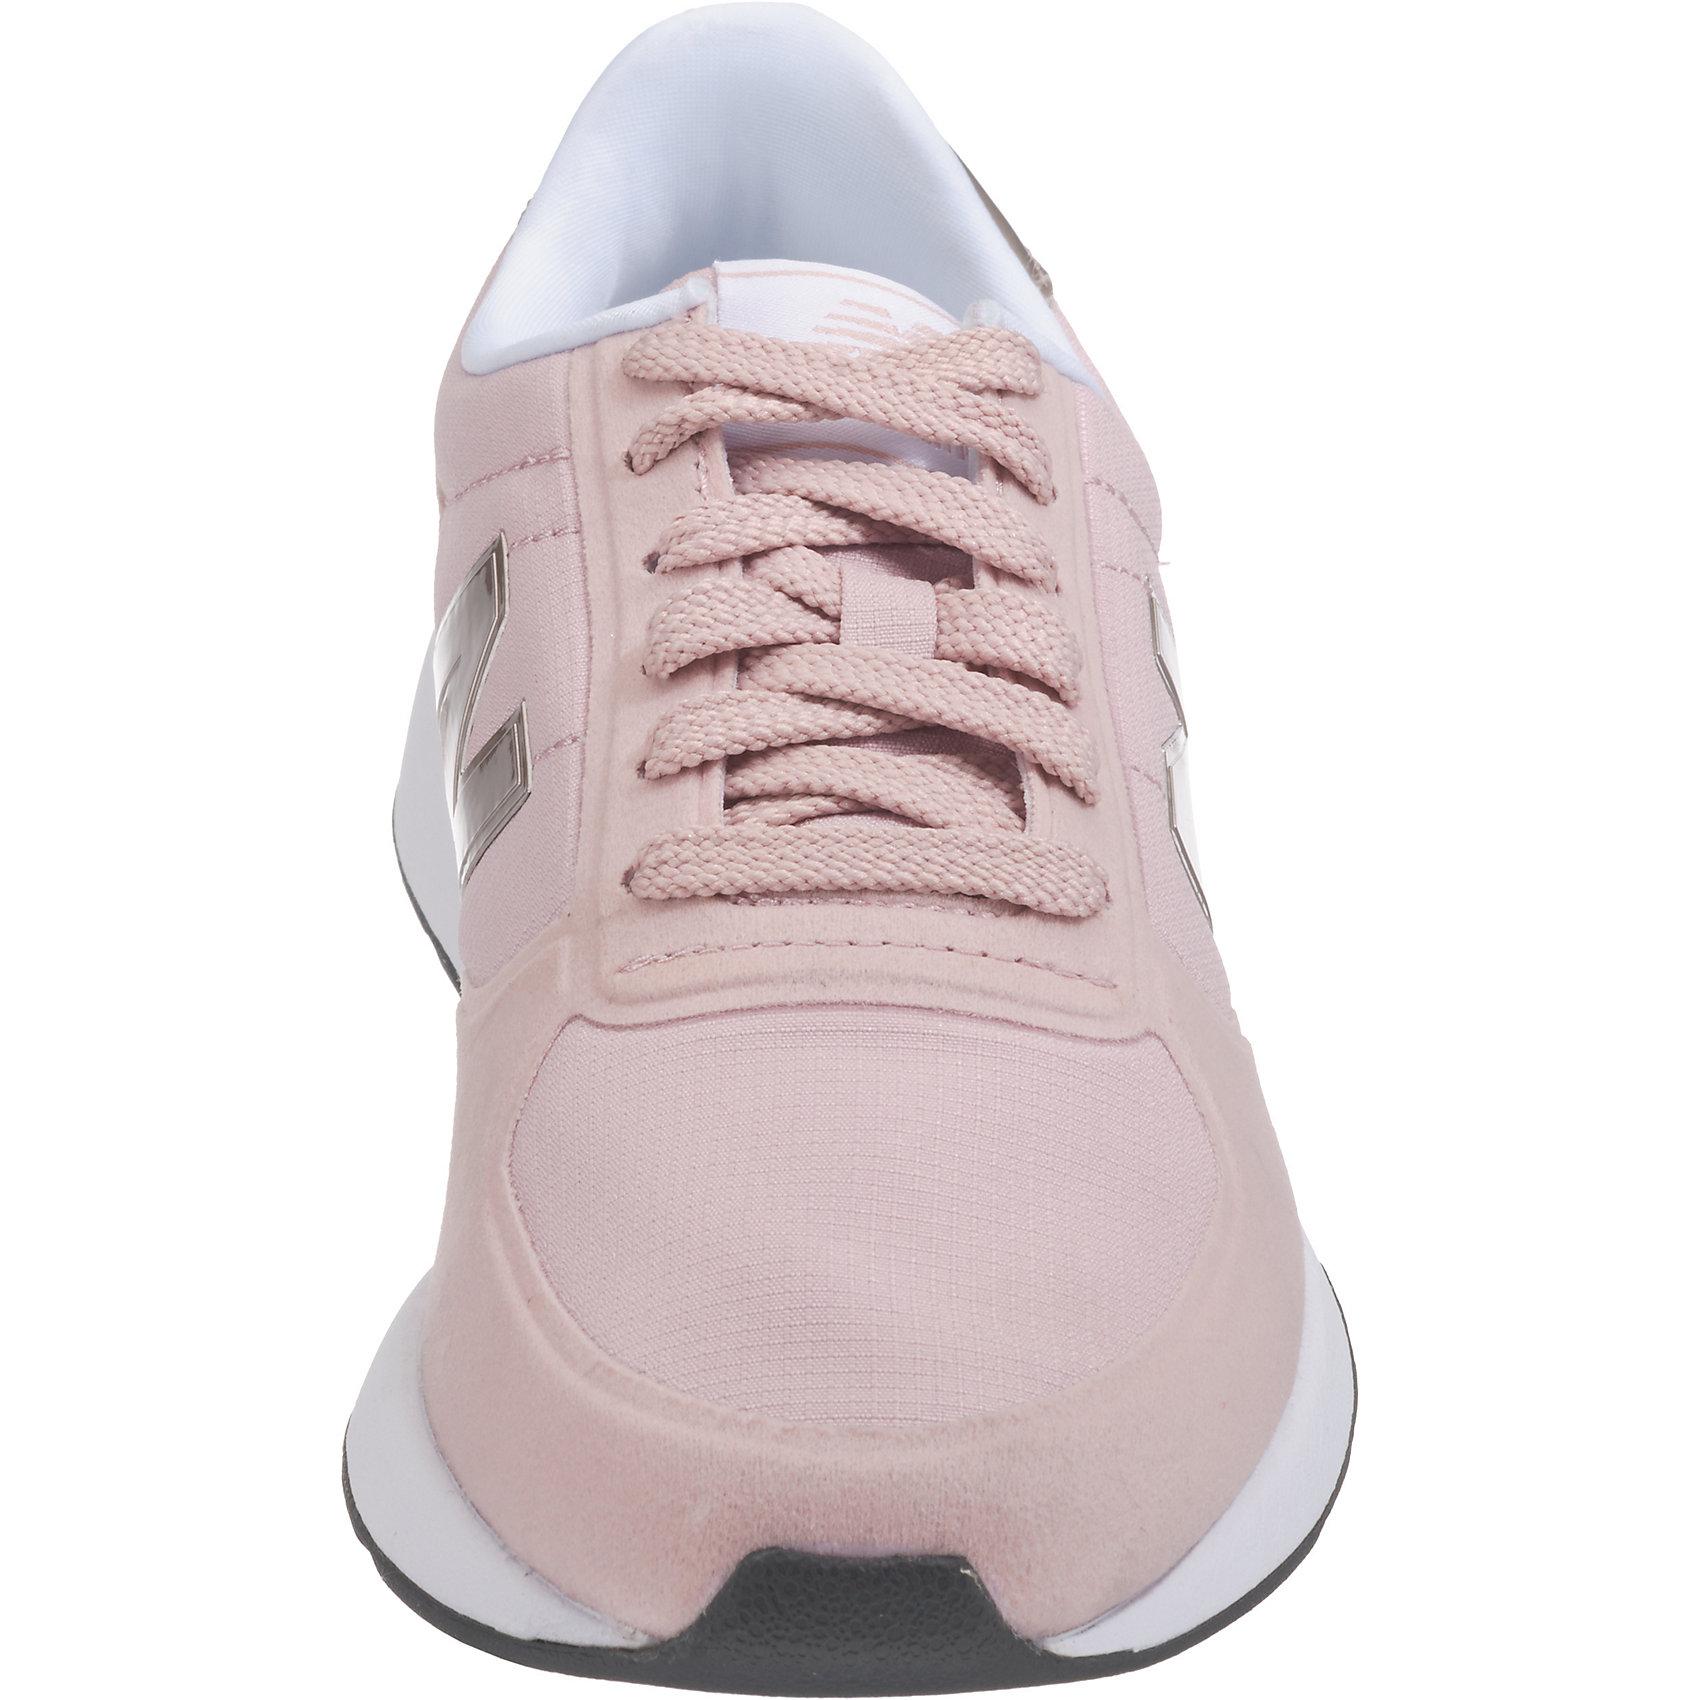 Neu NEU balance WS215 B Sneakers Low 7397962 für Damen rosa